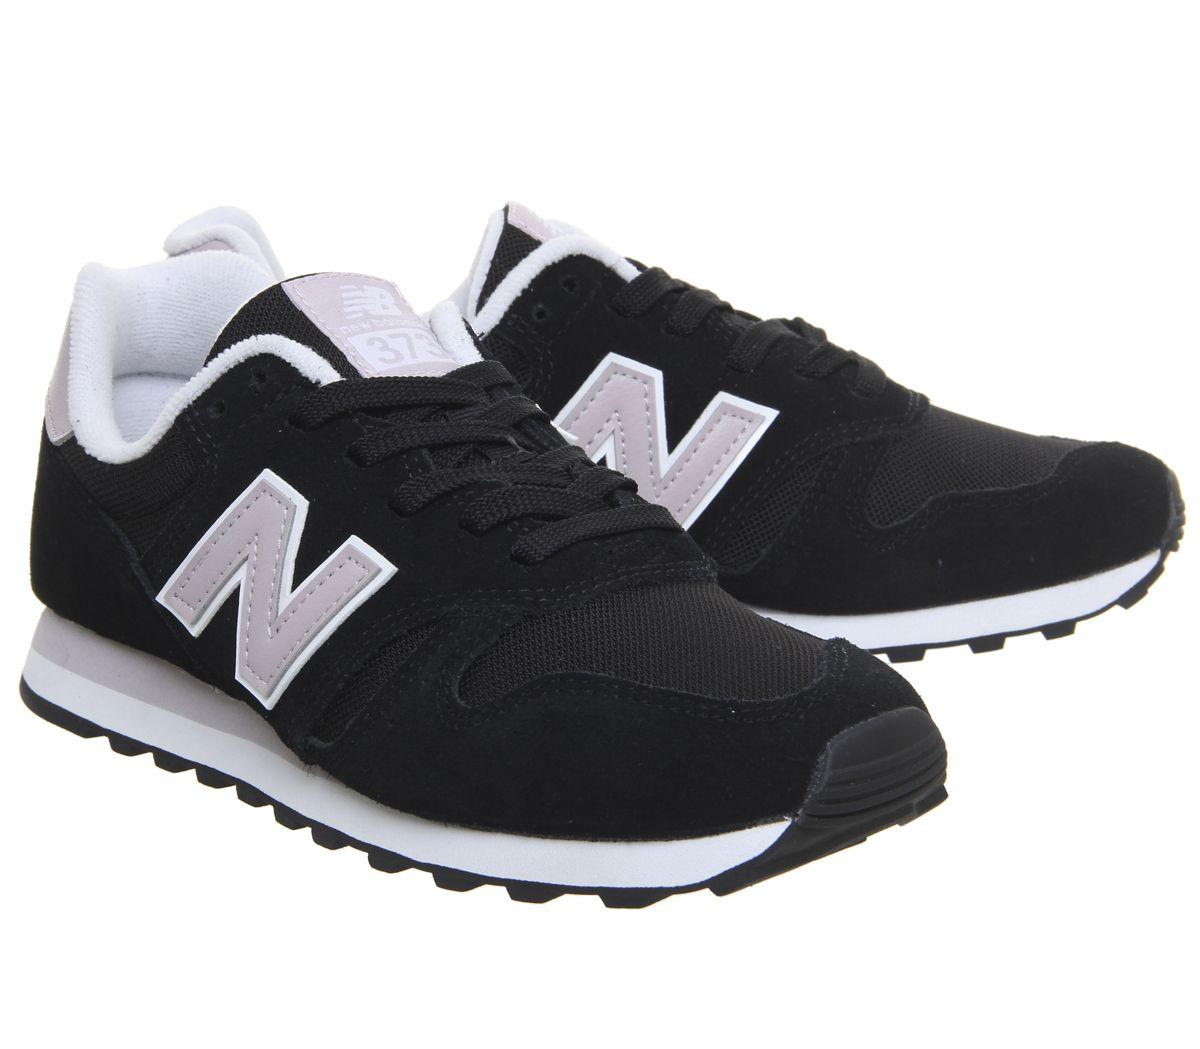 check-out cc2e4 c106e Details about Womens New Balance W373 Black Light Cashmere Trainers Shoes